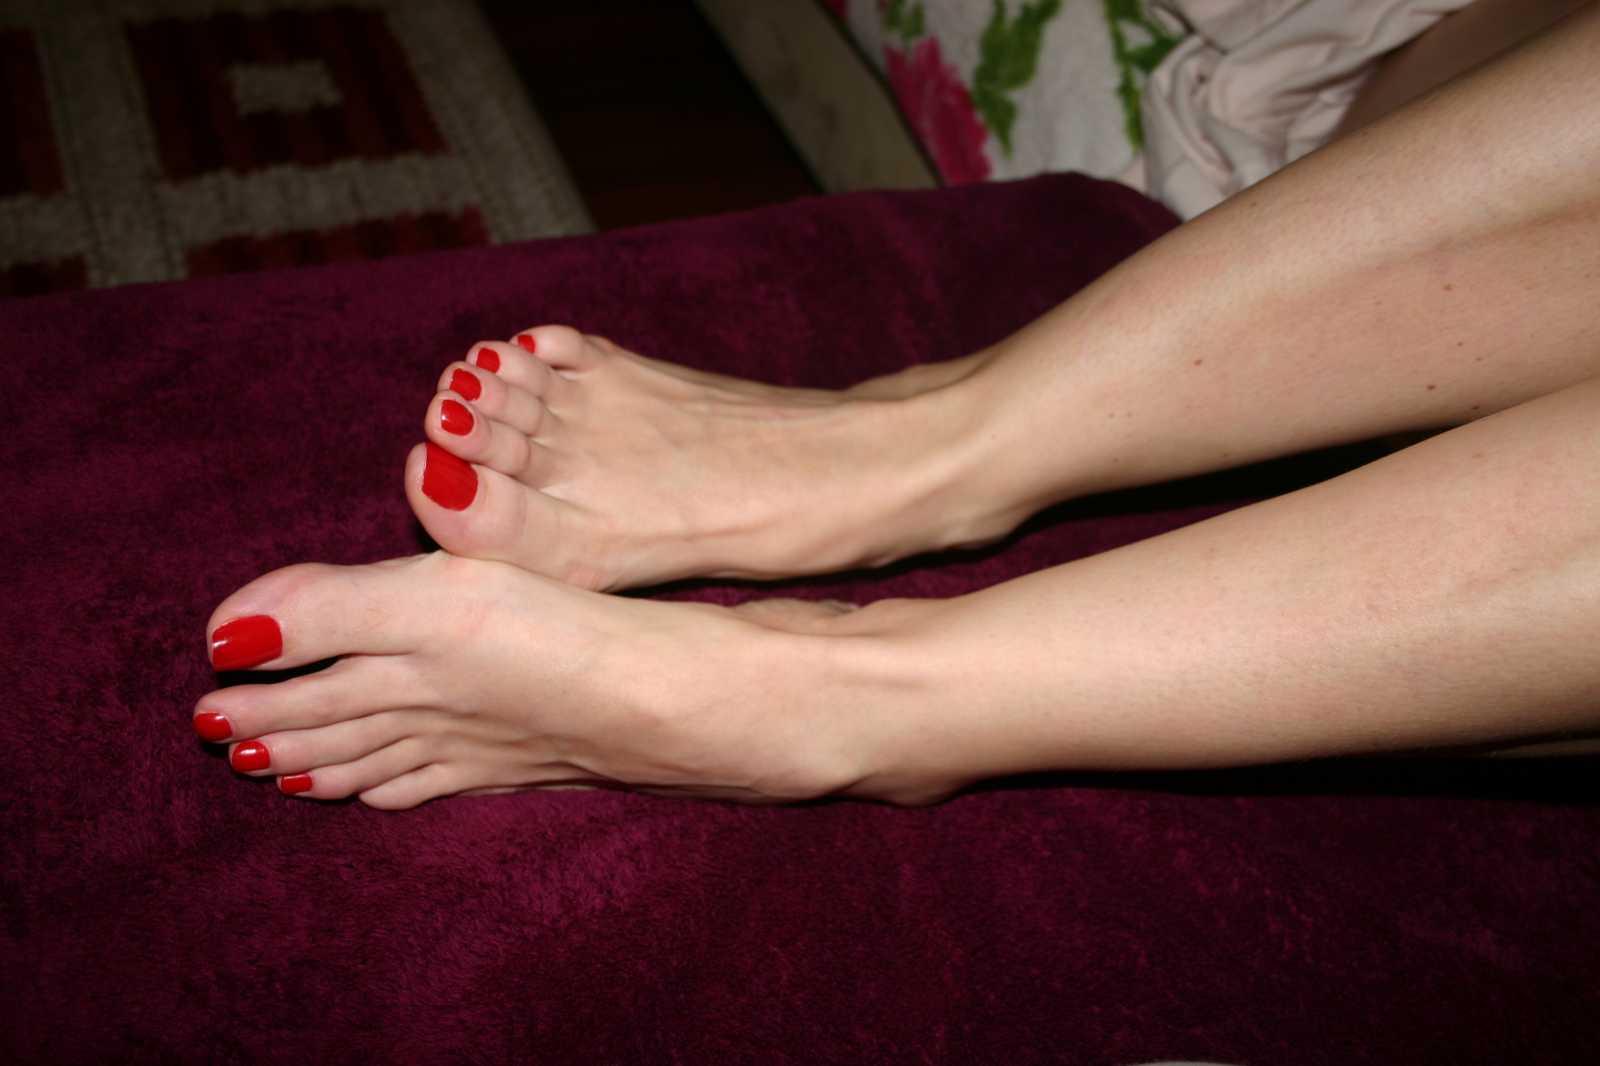 Порно видео онлайн сперма на пальчиках ног